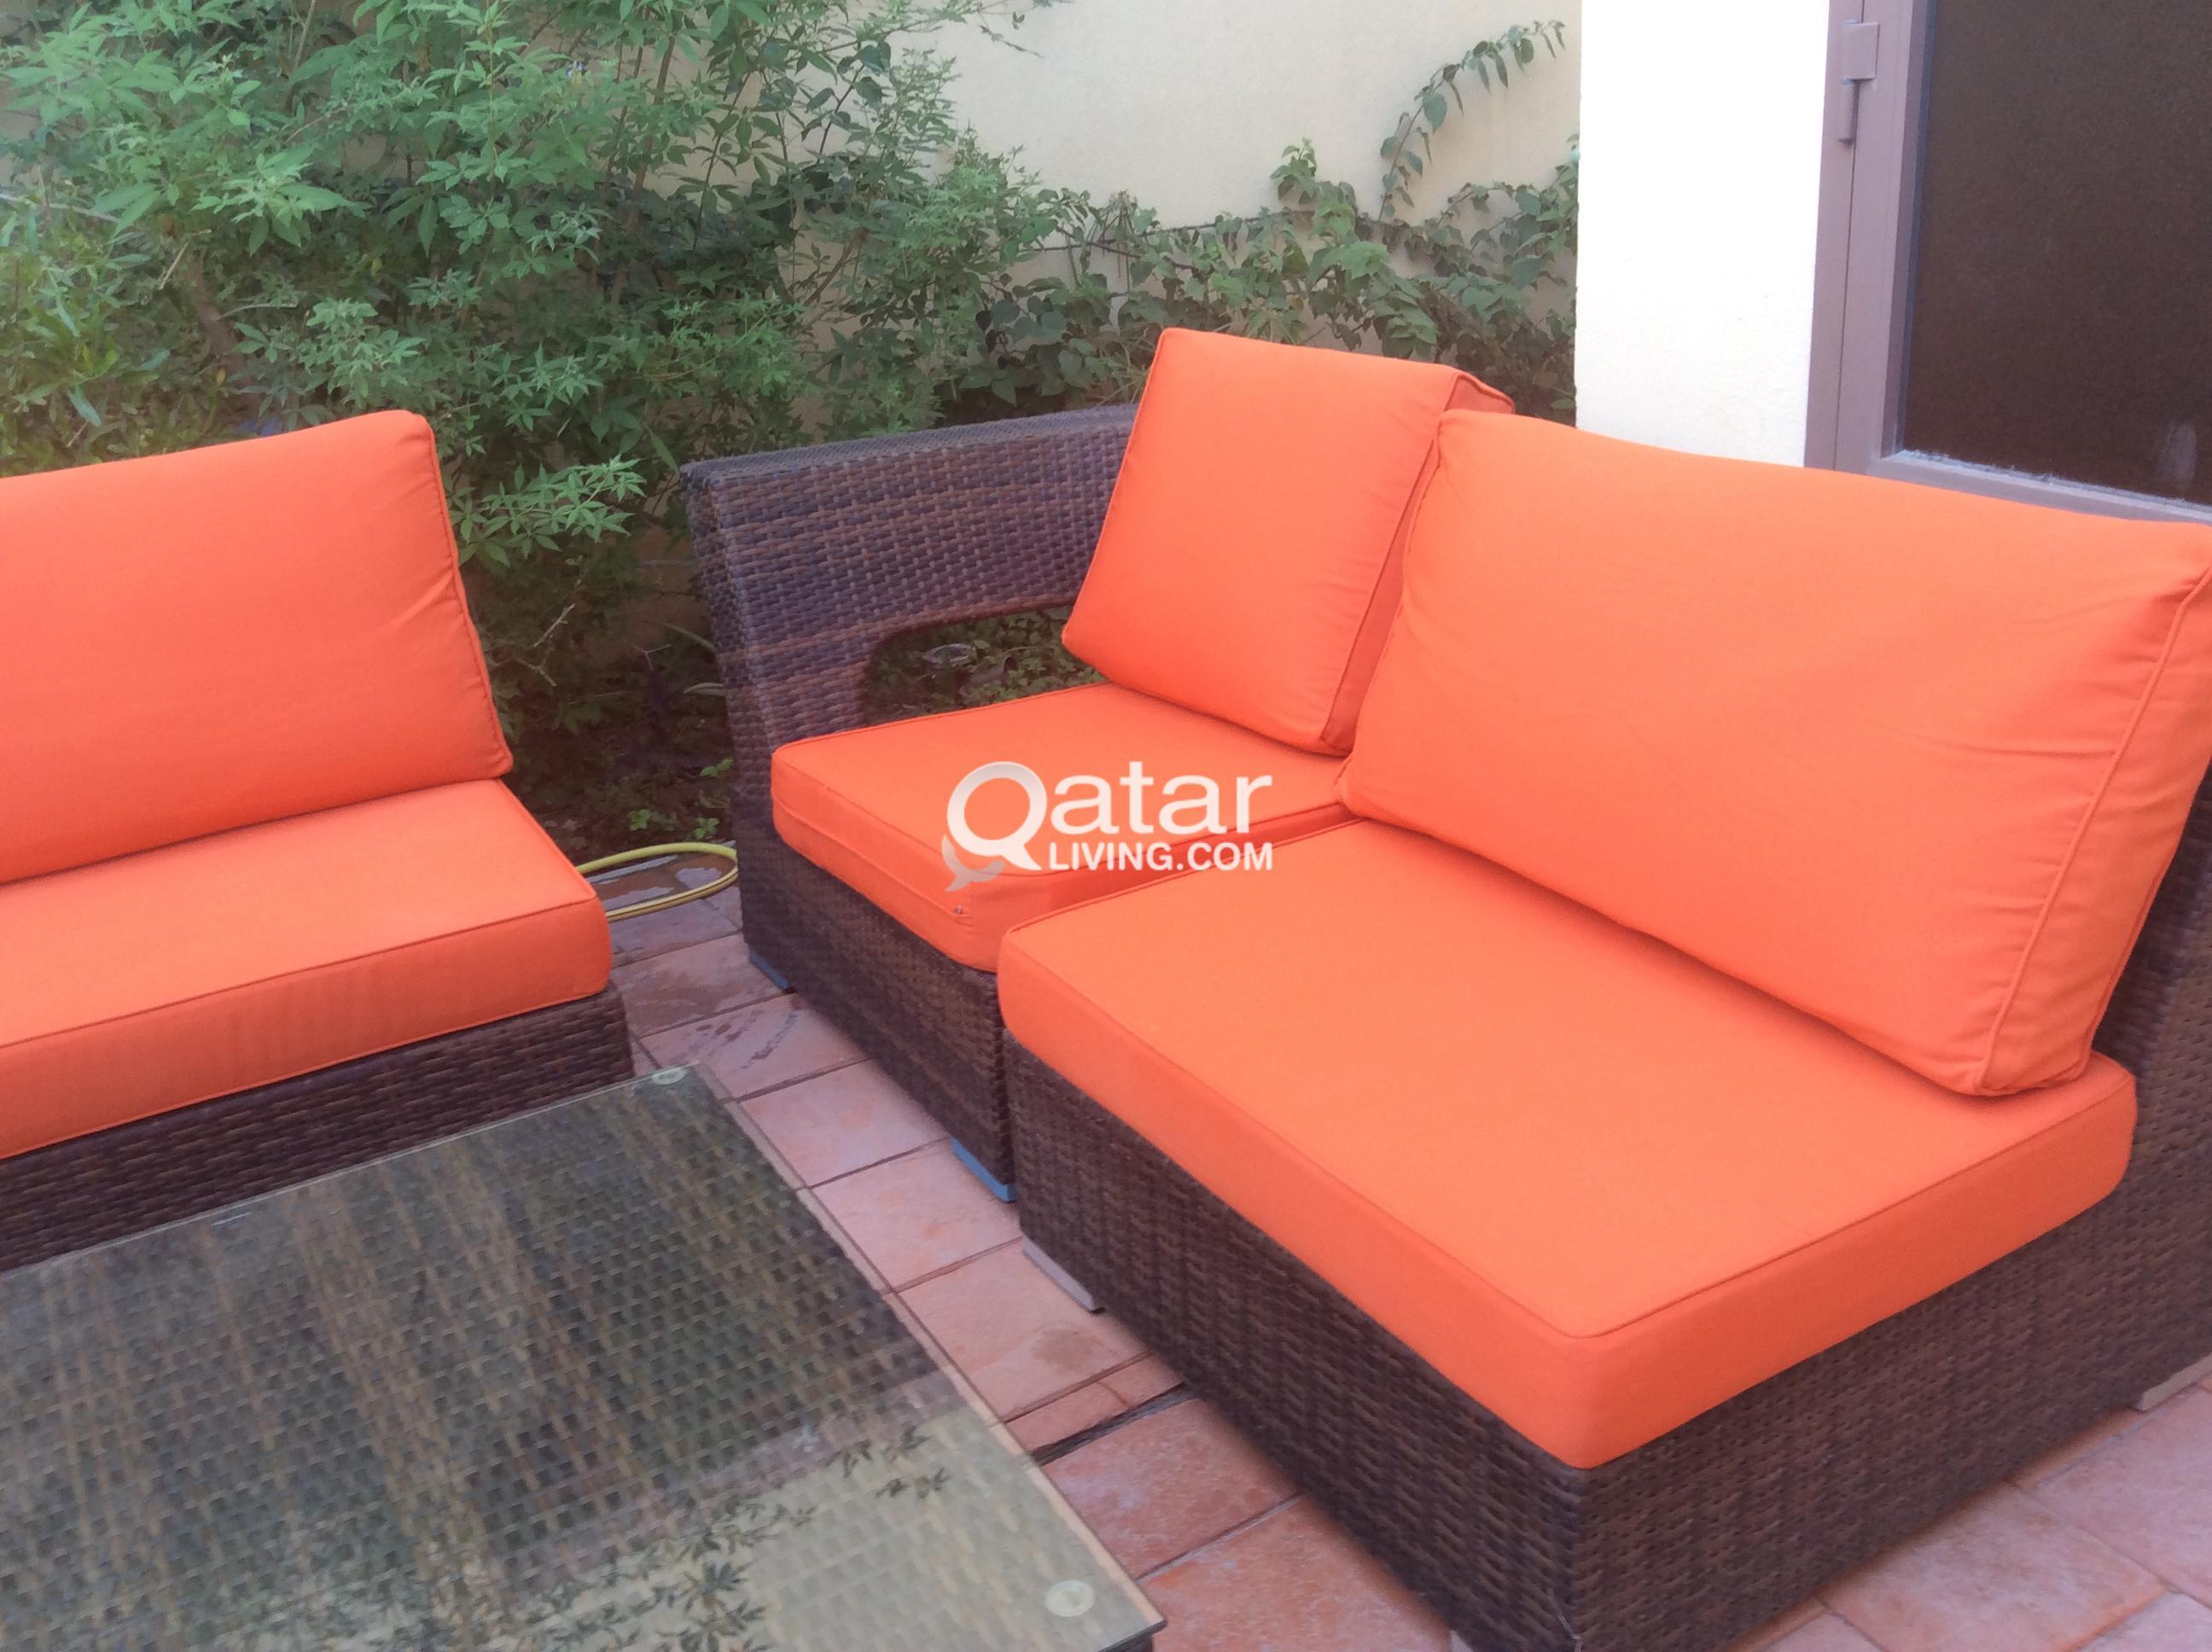 Extraordinary outdoor furniture qatar living gallery for Outdoor furniture qatar